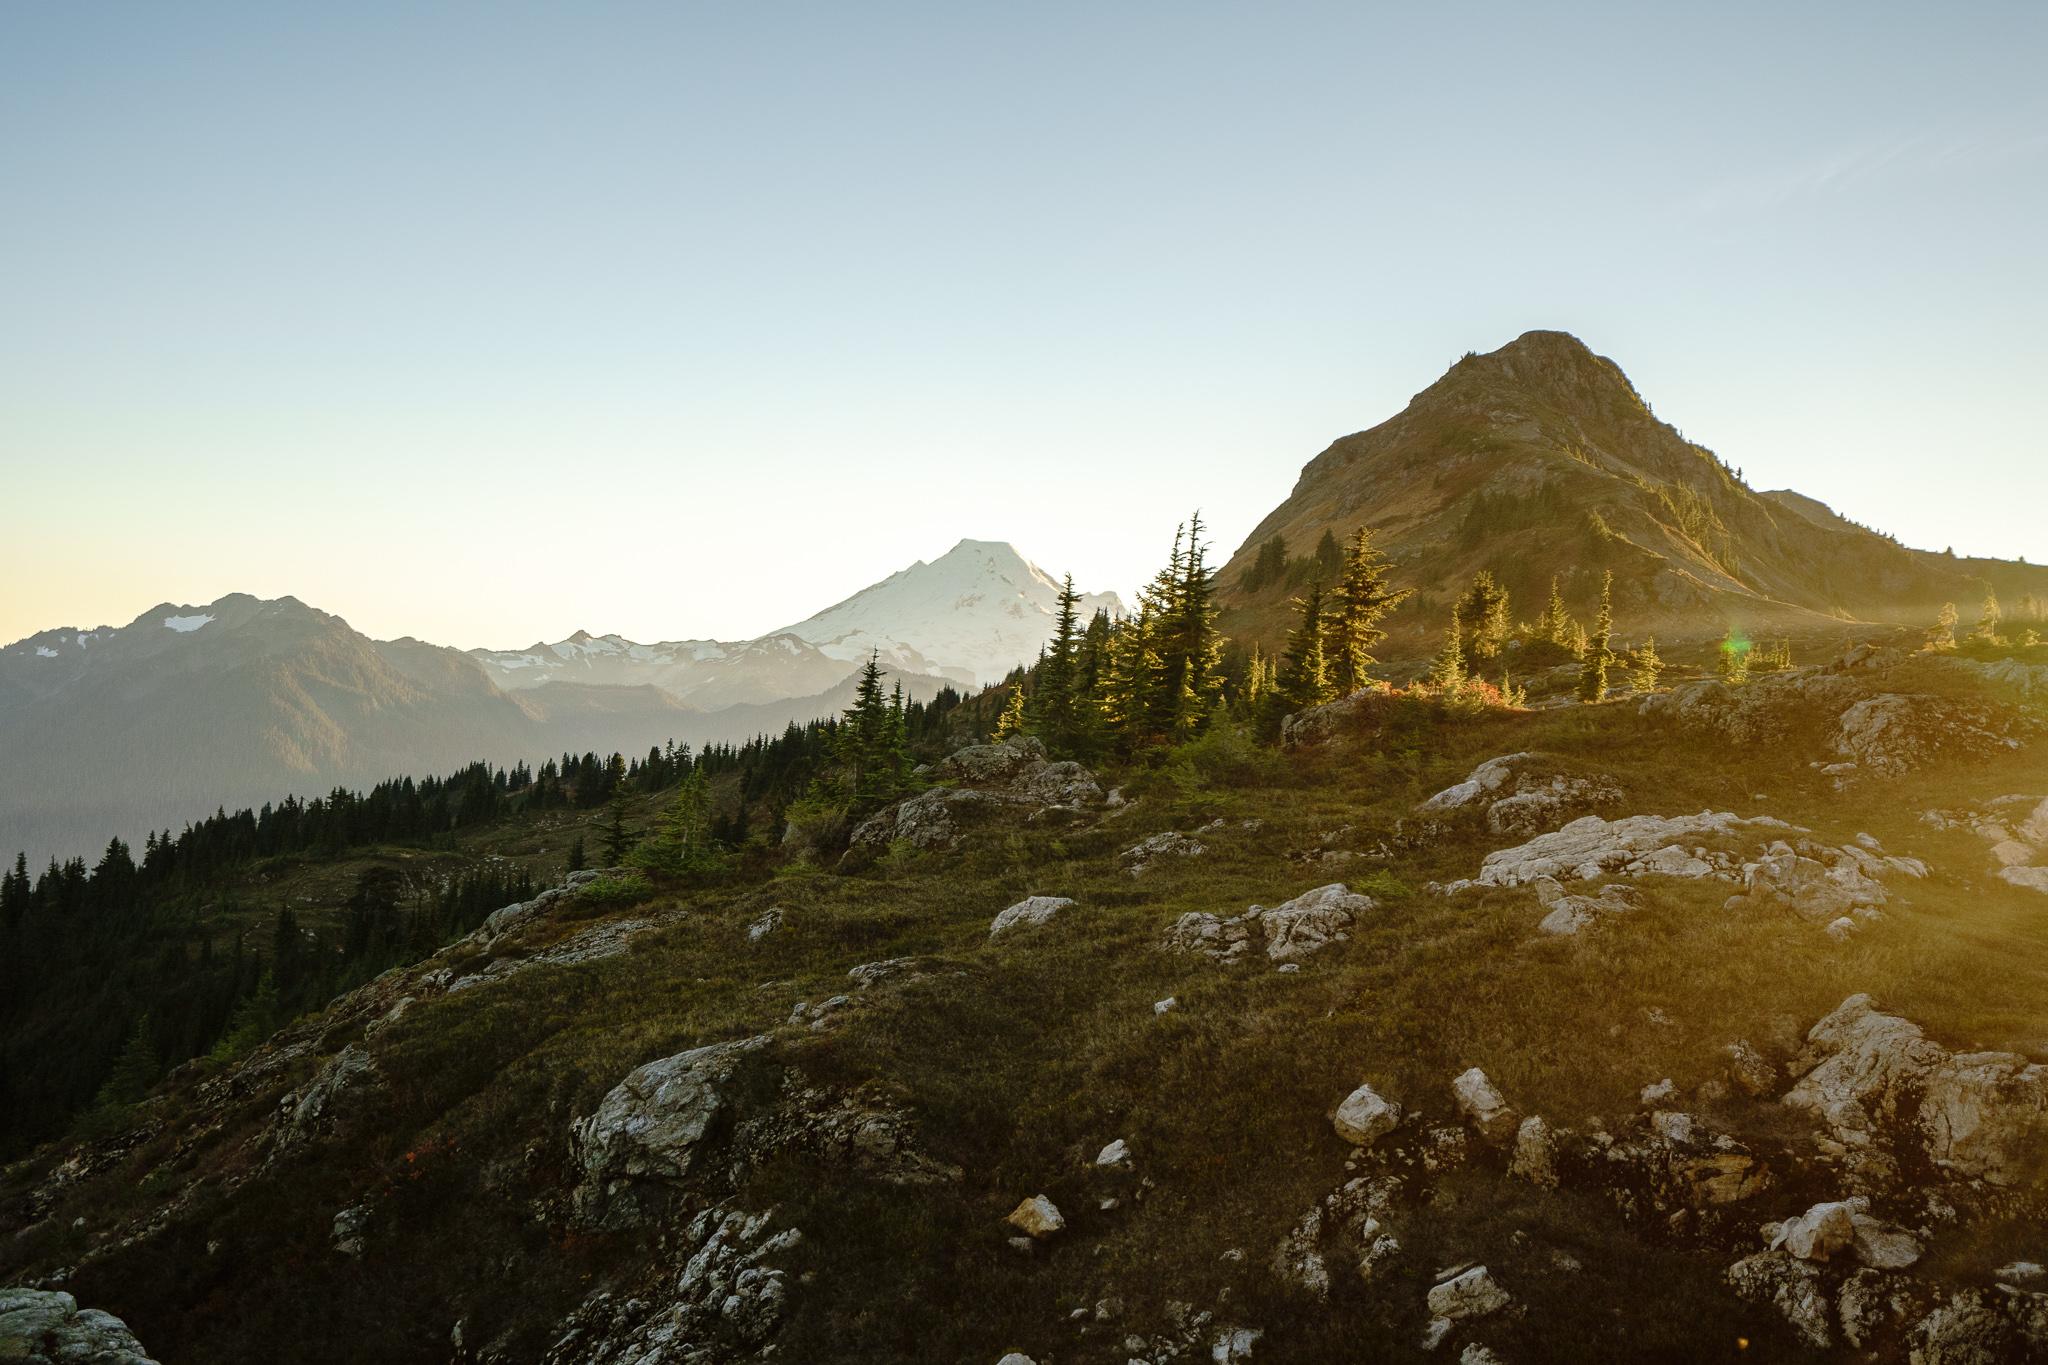 Golden hour + Mt. Baker